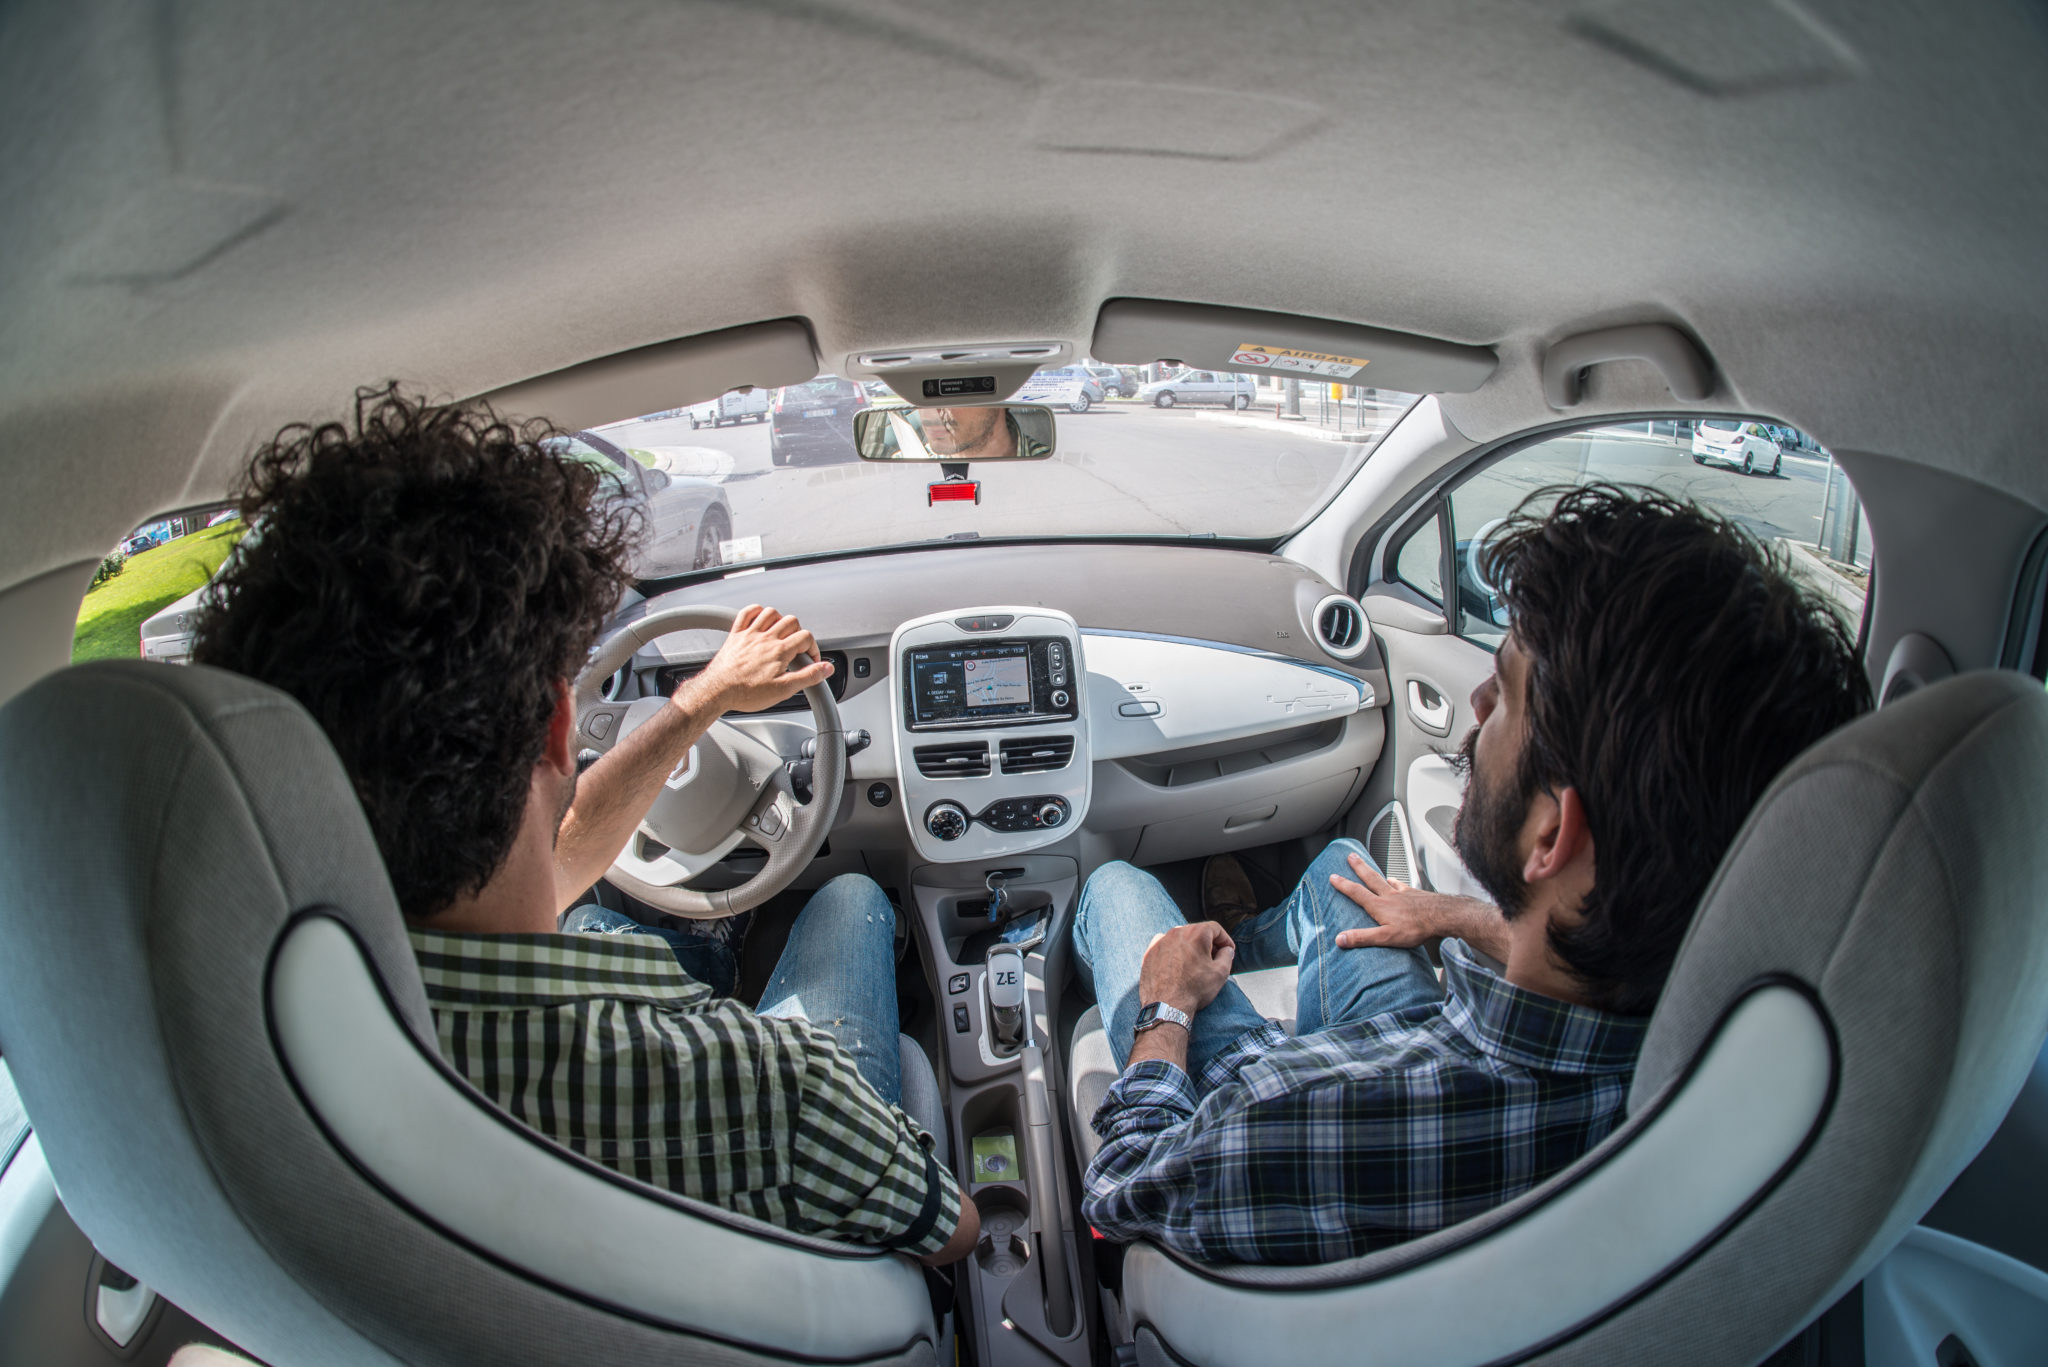 zemove, car sharing